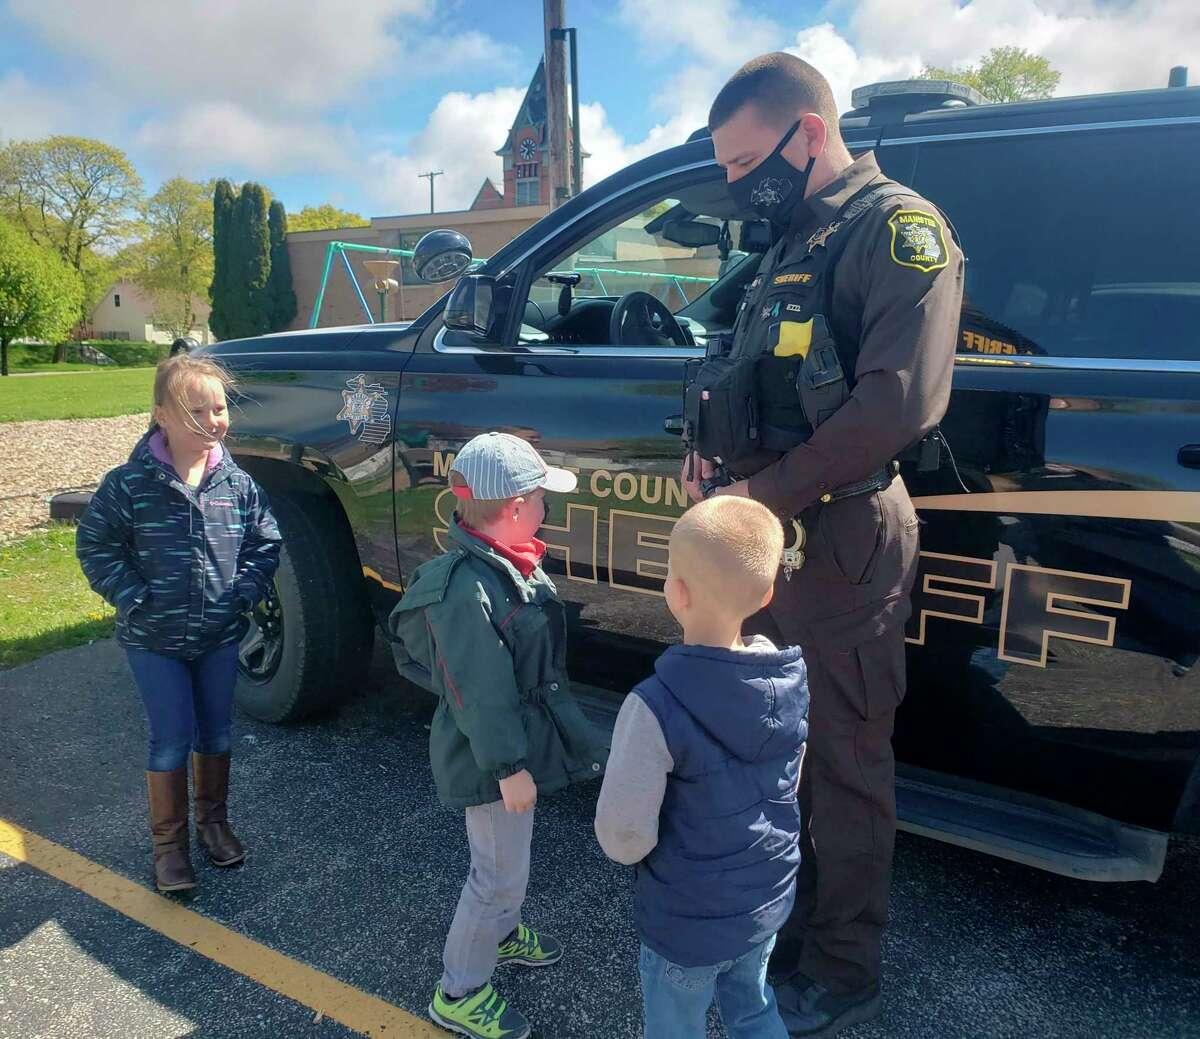 Trinity Lutheran preschool teacher Lynne Gatz hopes a visit from Manistee County Sheriff'sOfficeDeputy Jason Traeger willmake her students feel comfortable talking with law enforcement. (Courtesy photo)